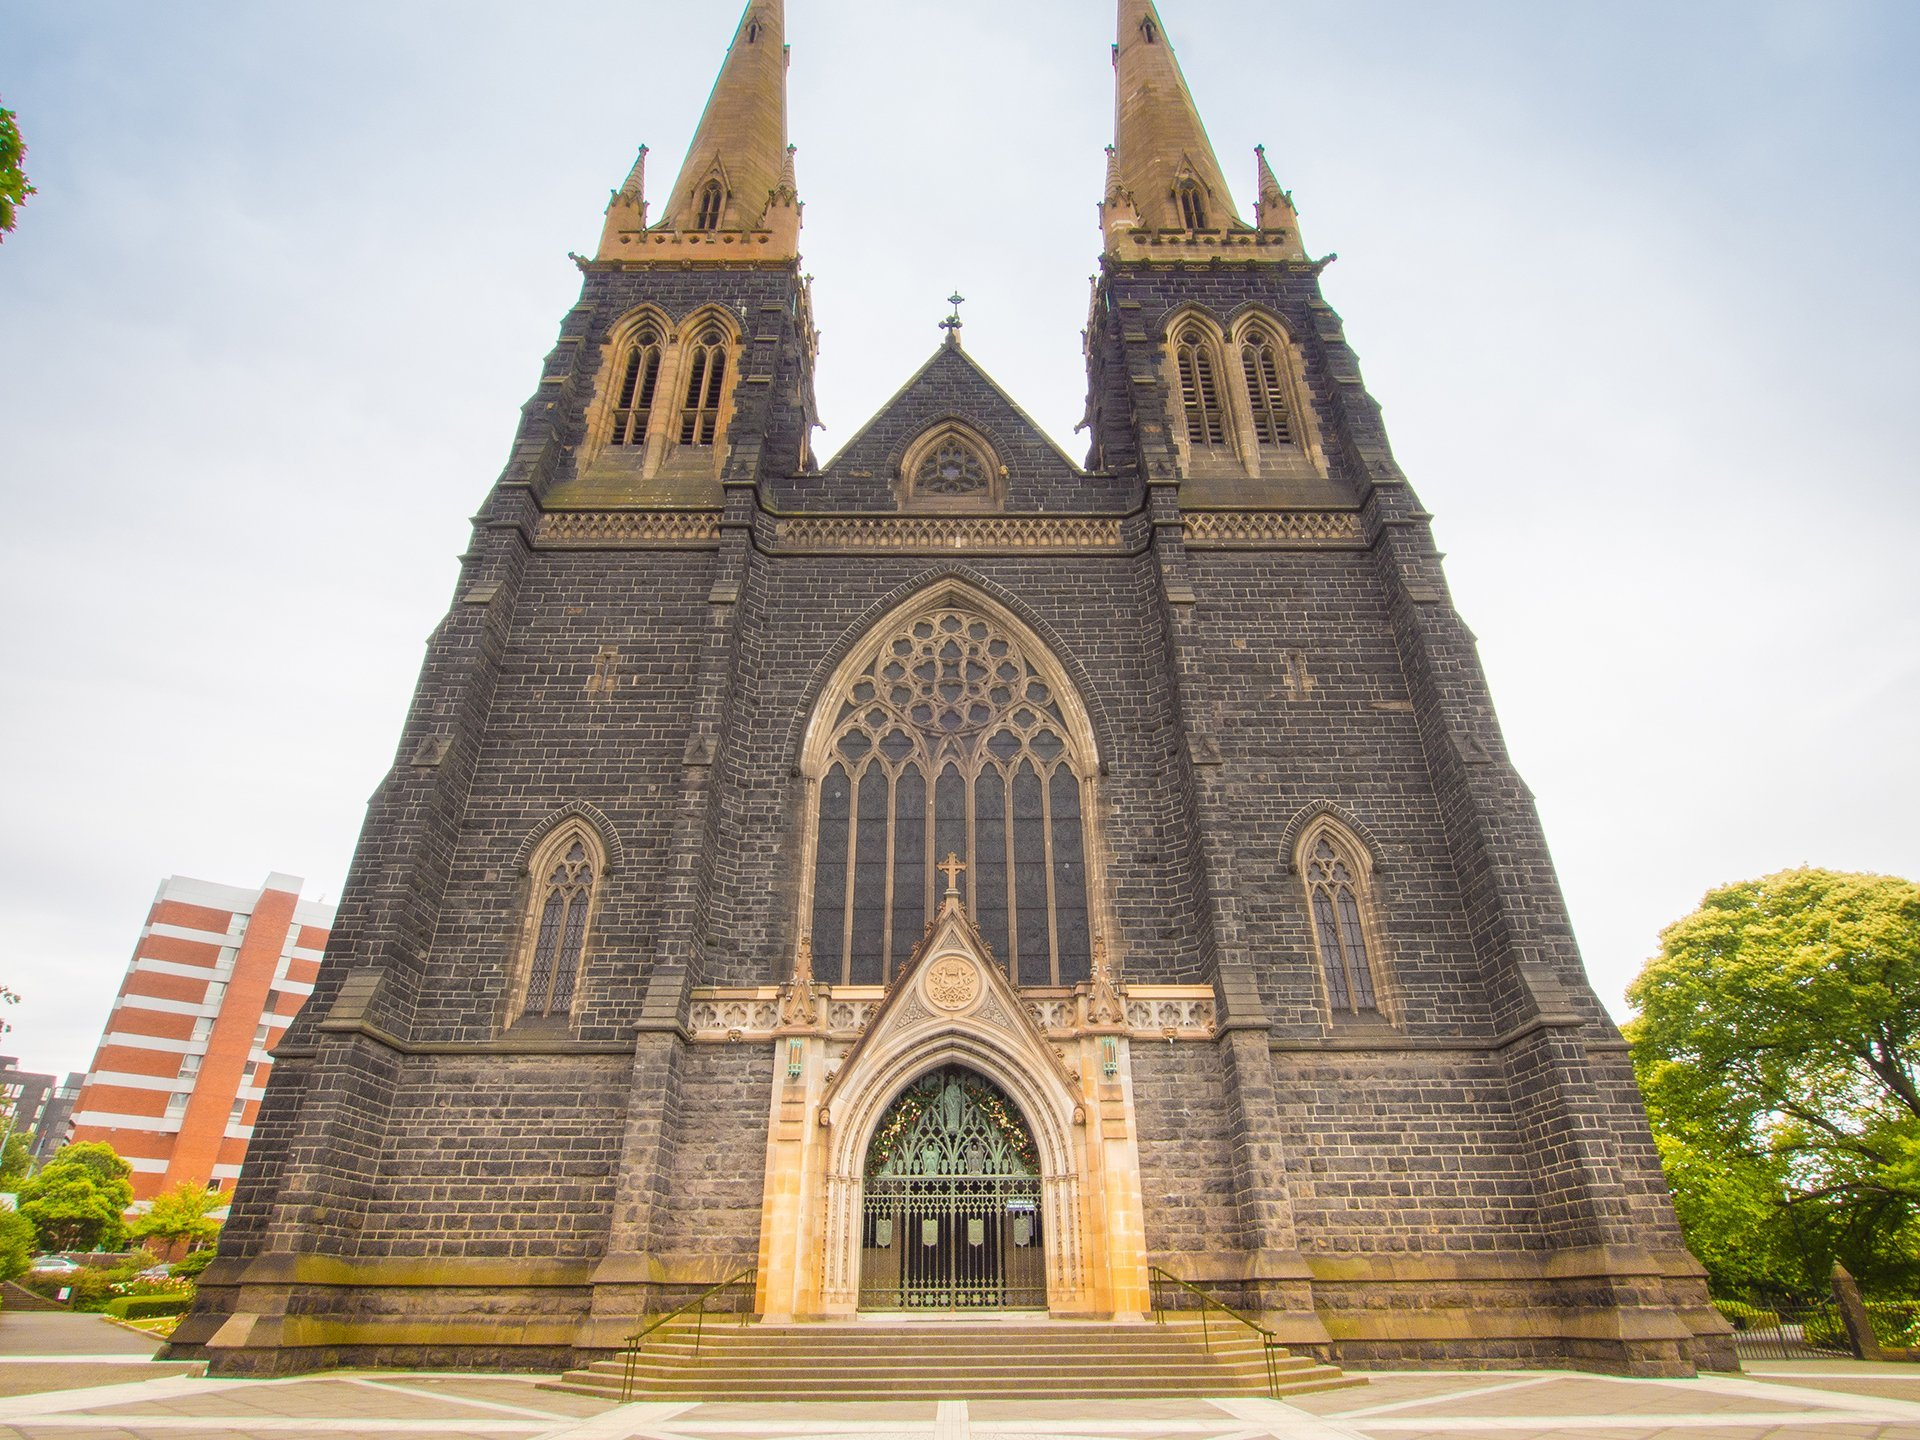 St. Patricks - Wide Angle